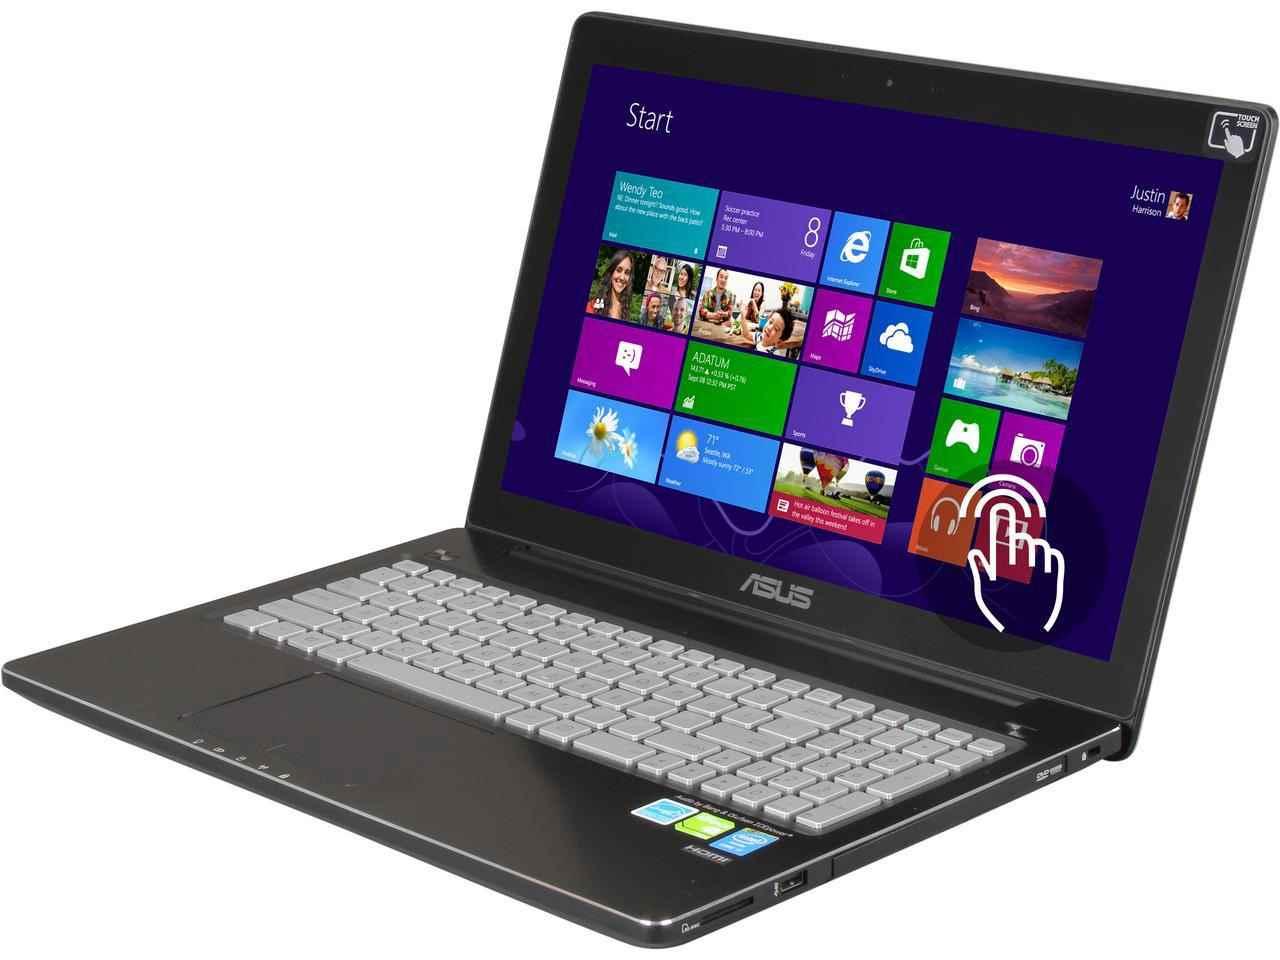 لپ تاپ استوک ایسوس مدل ASUS Q550LF - تاچ(لمسی)